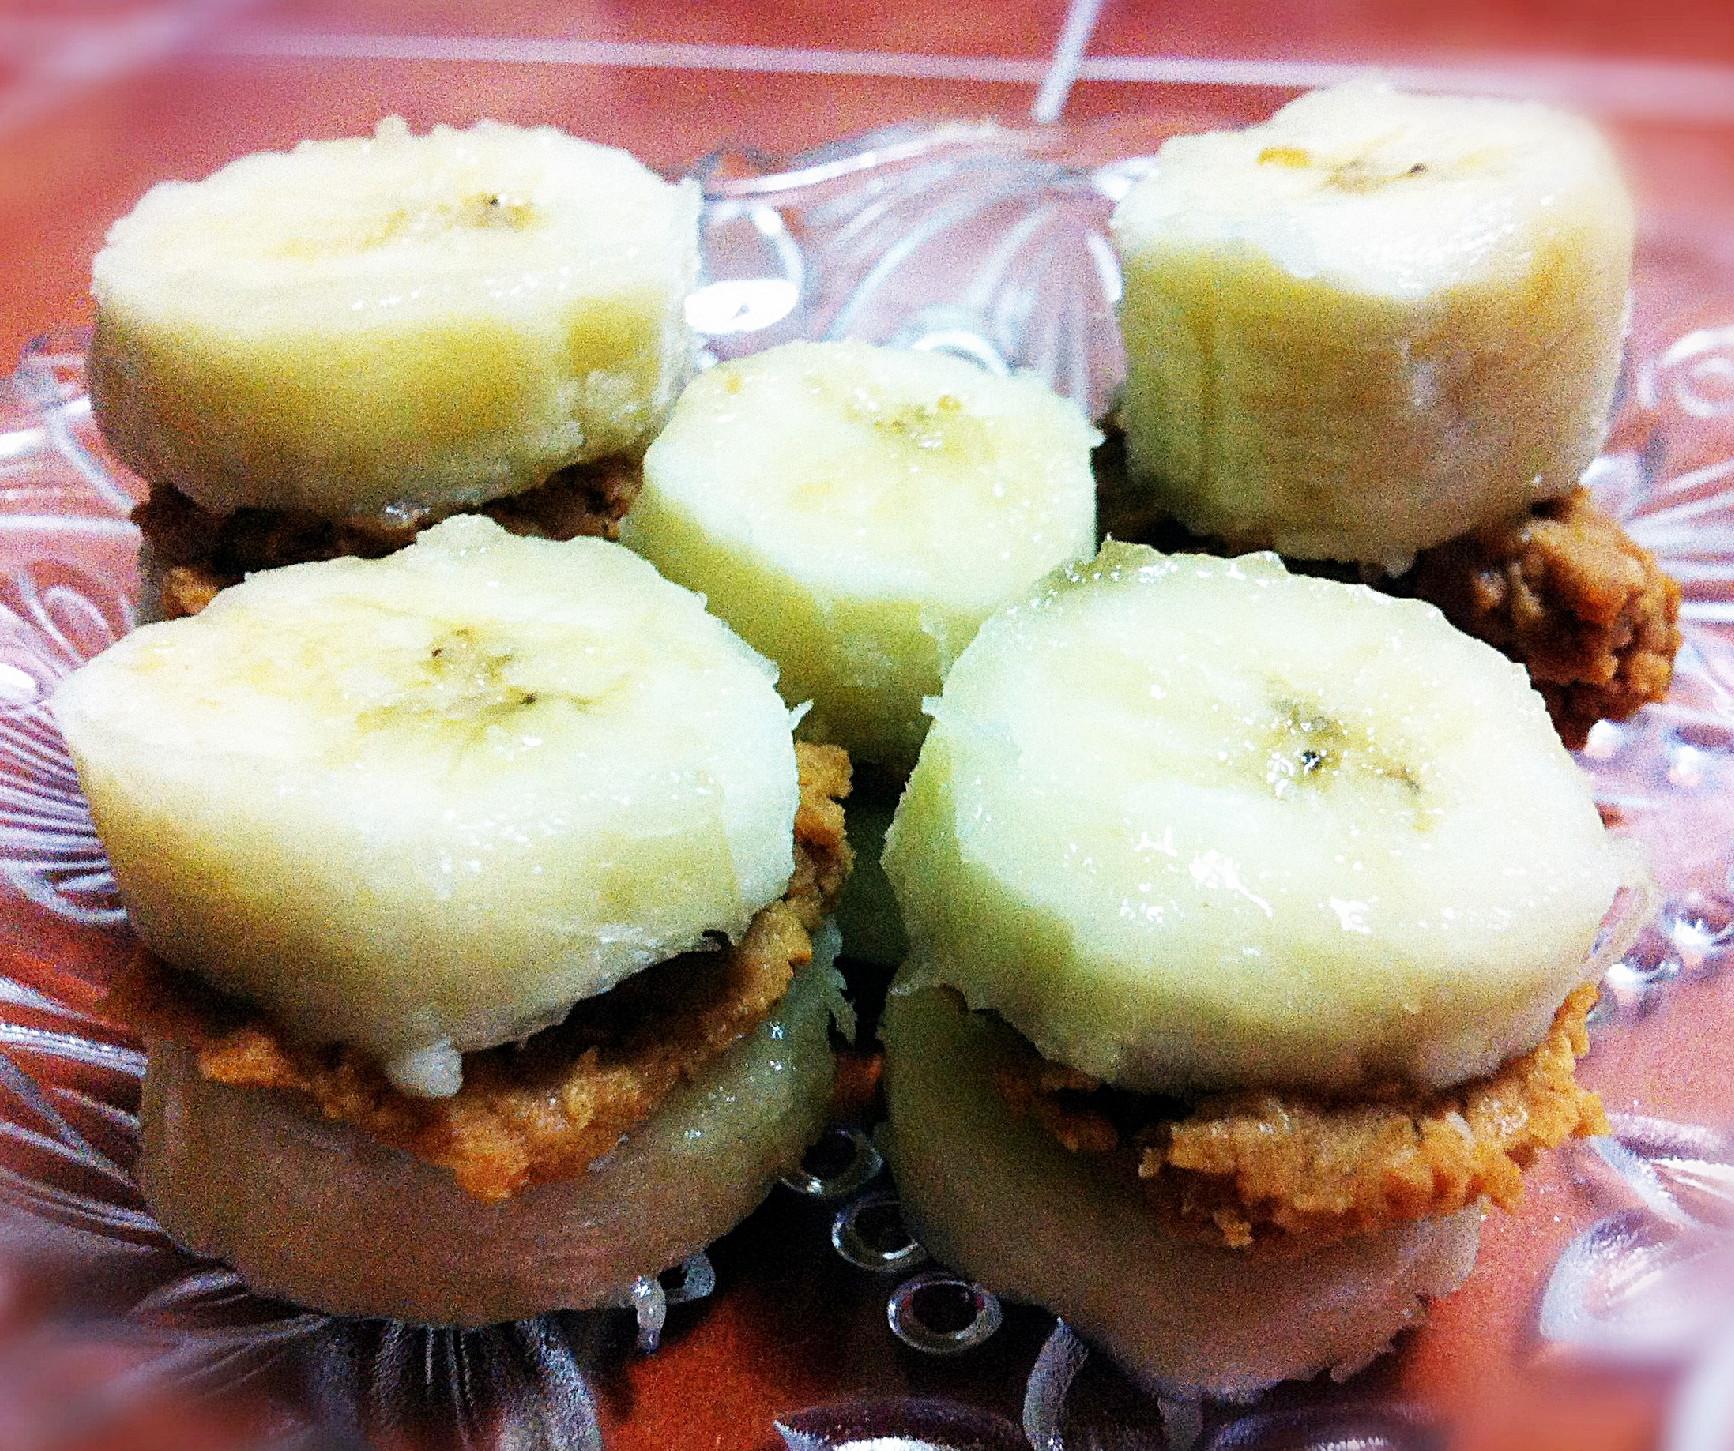 Banana Desserts Healthy  Healthy Dessert Ideas Banana and Peanut Butter Bites